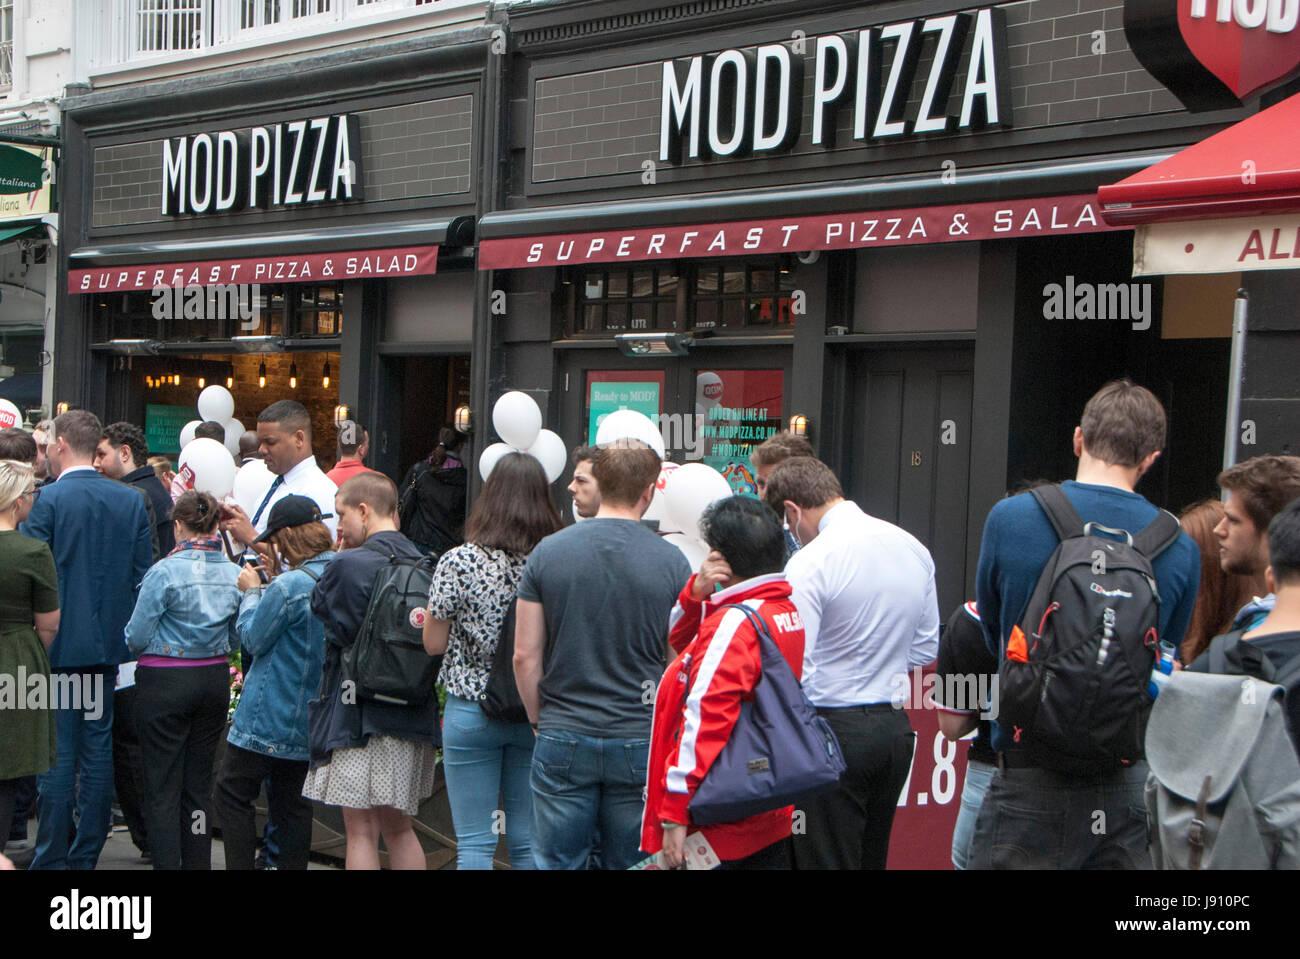 Mod Pizza Stock Photos Mod Pizza Stock Images Alamy